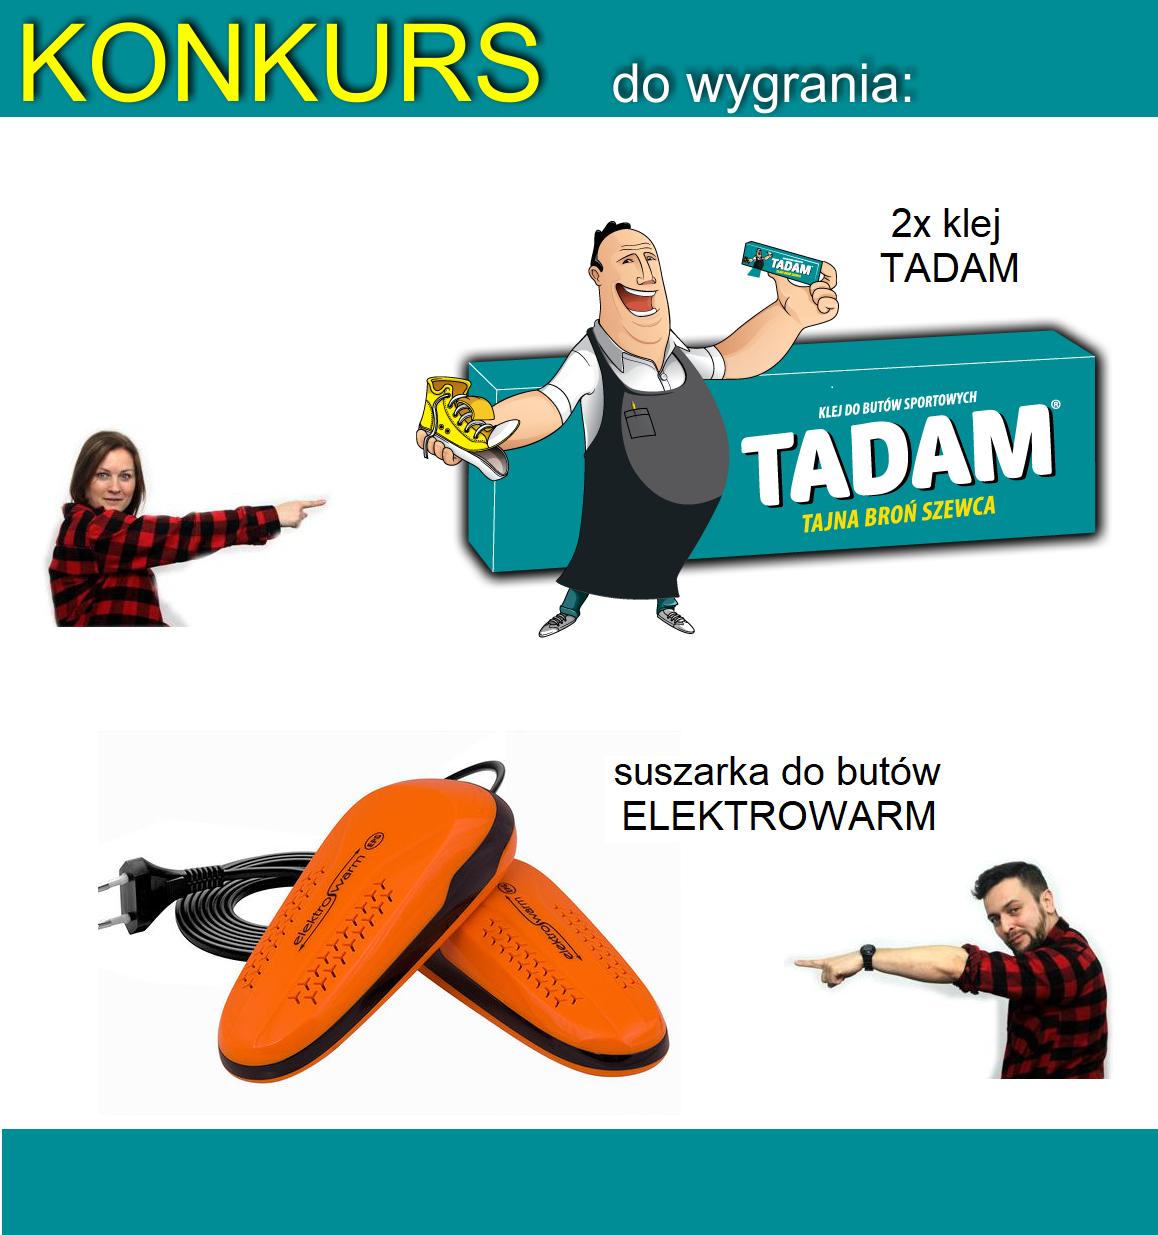 klej TADAM konkurs